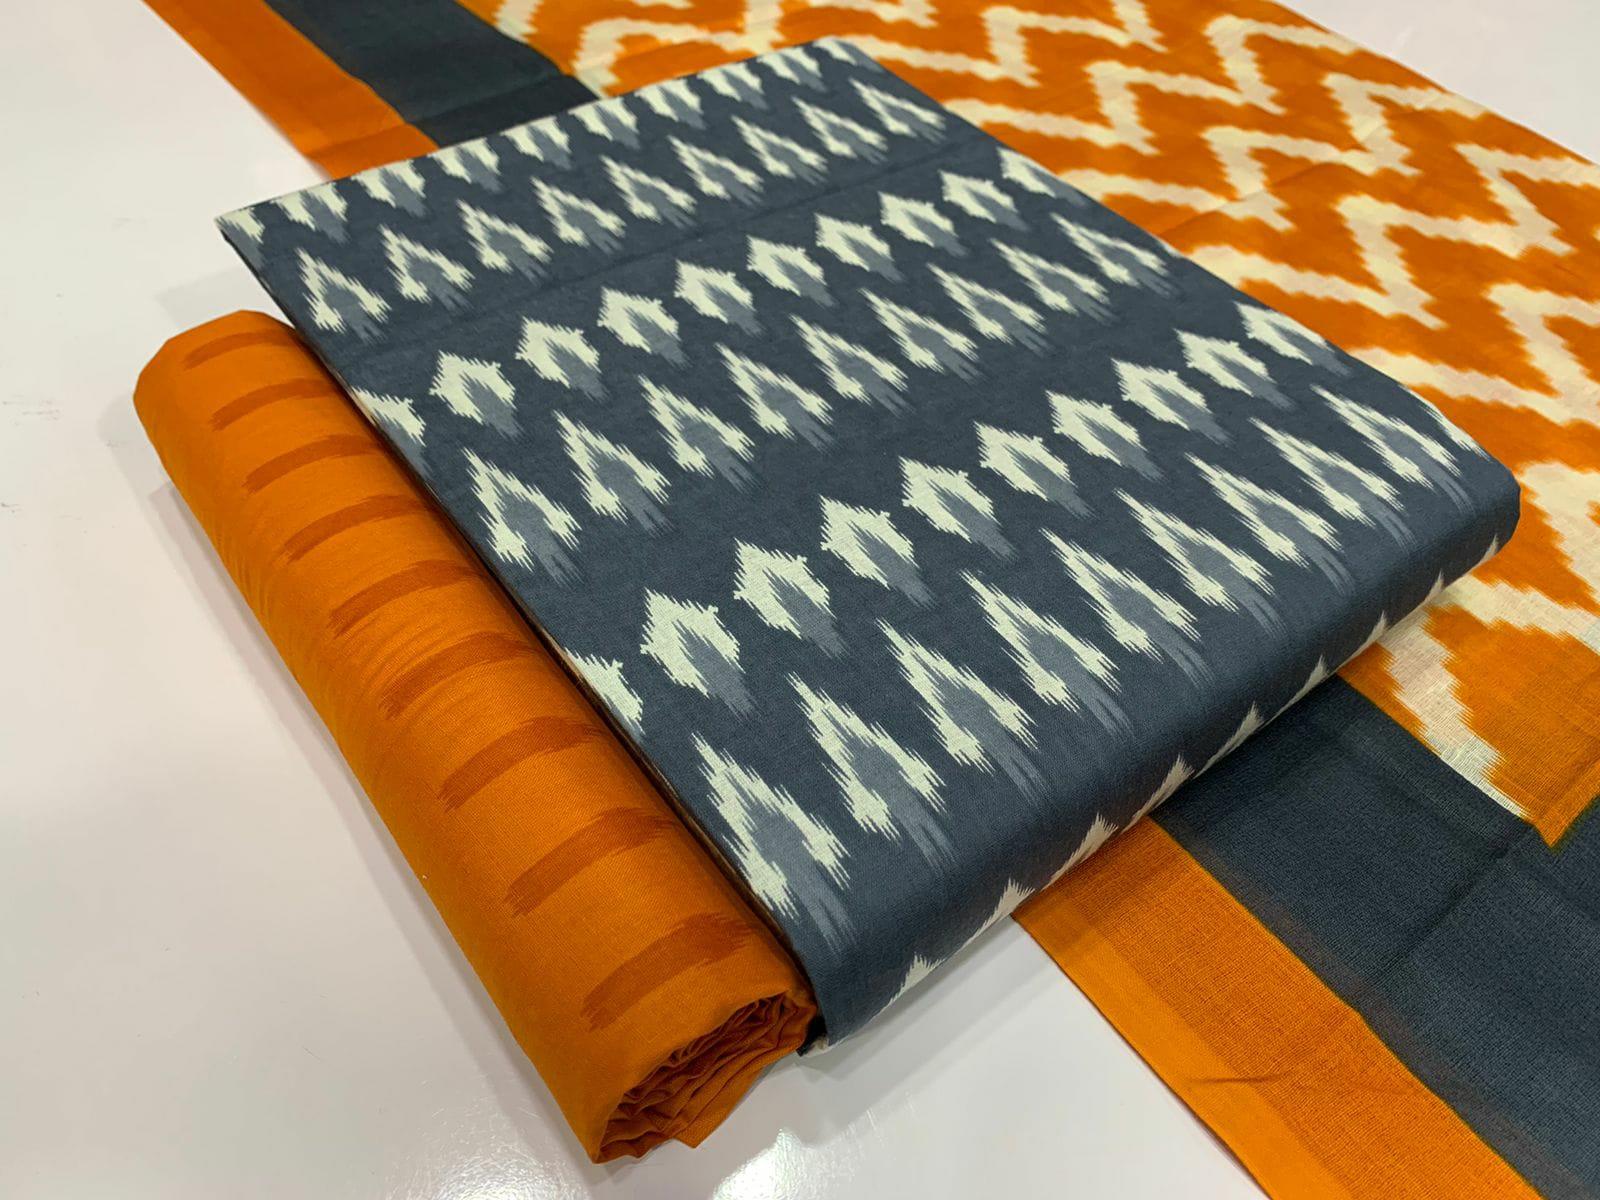 Suresh Soft Cotton Special Ikkat Salwar Suits Catalog Lowest Price